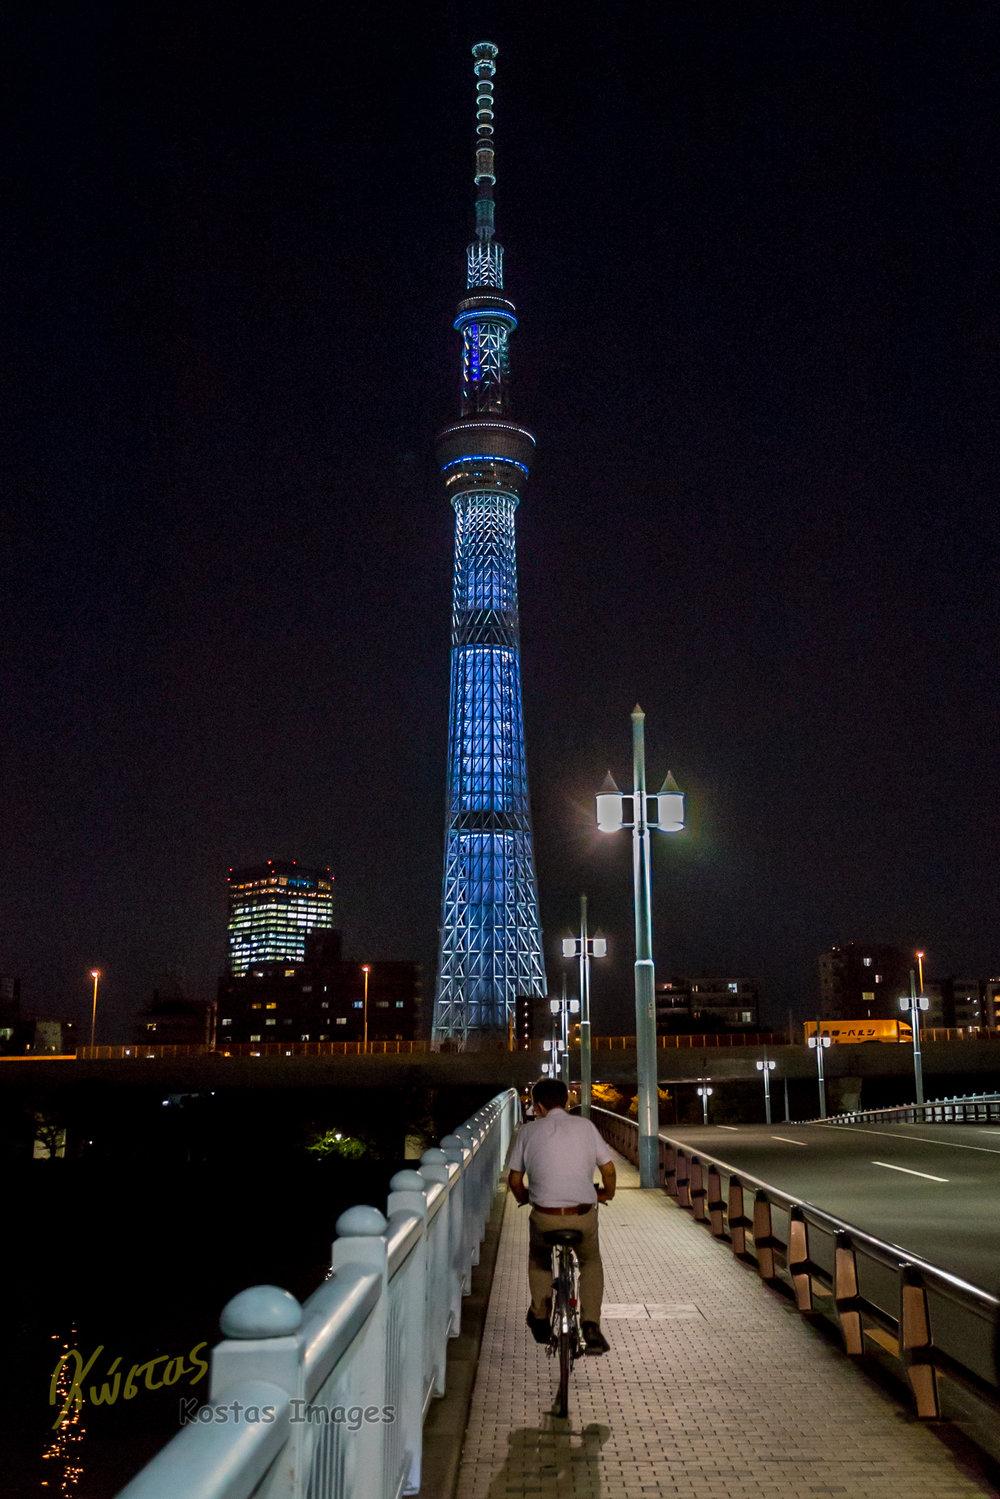 20160901-IMG_6262-Tokyo SkyTree Tower and biker.jpg